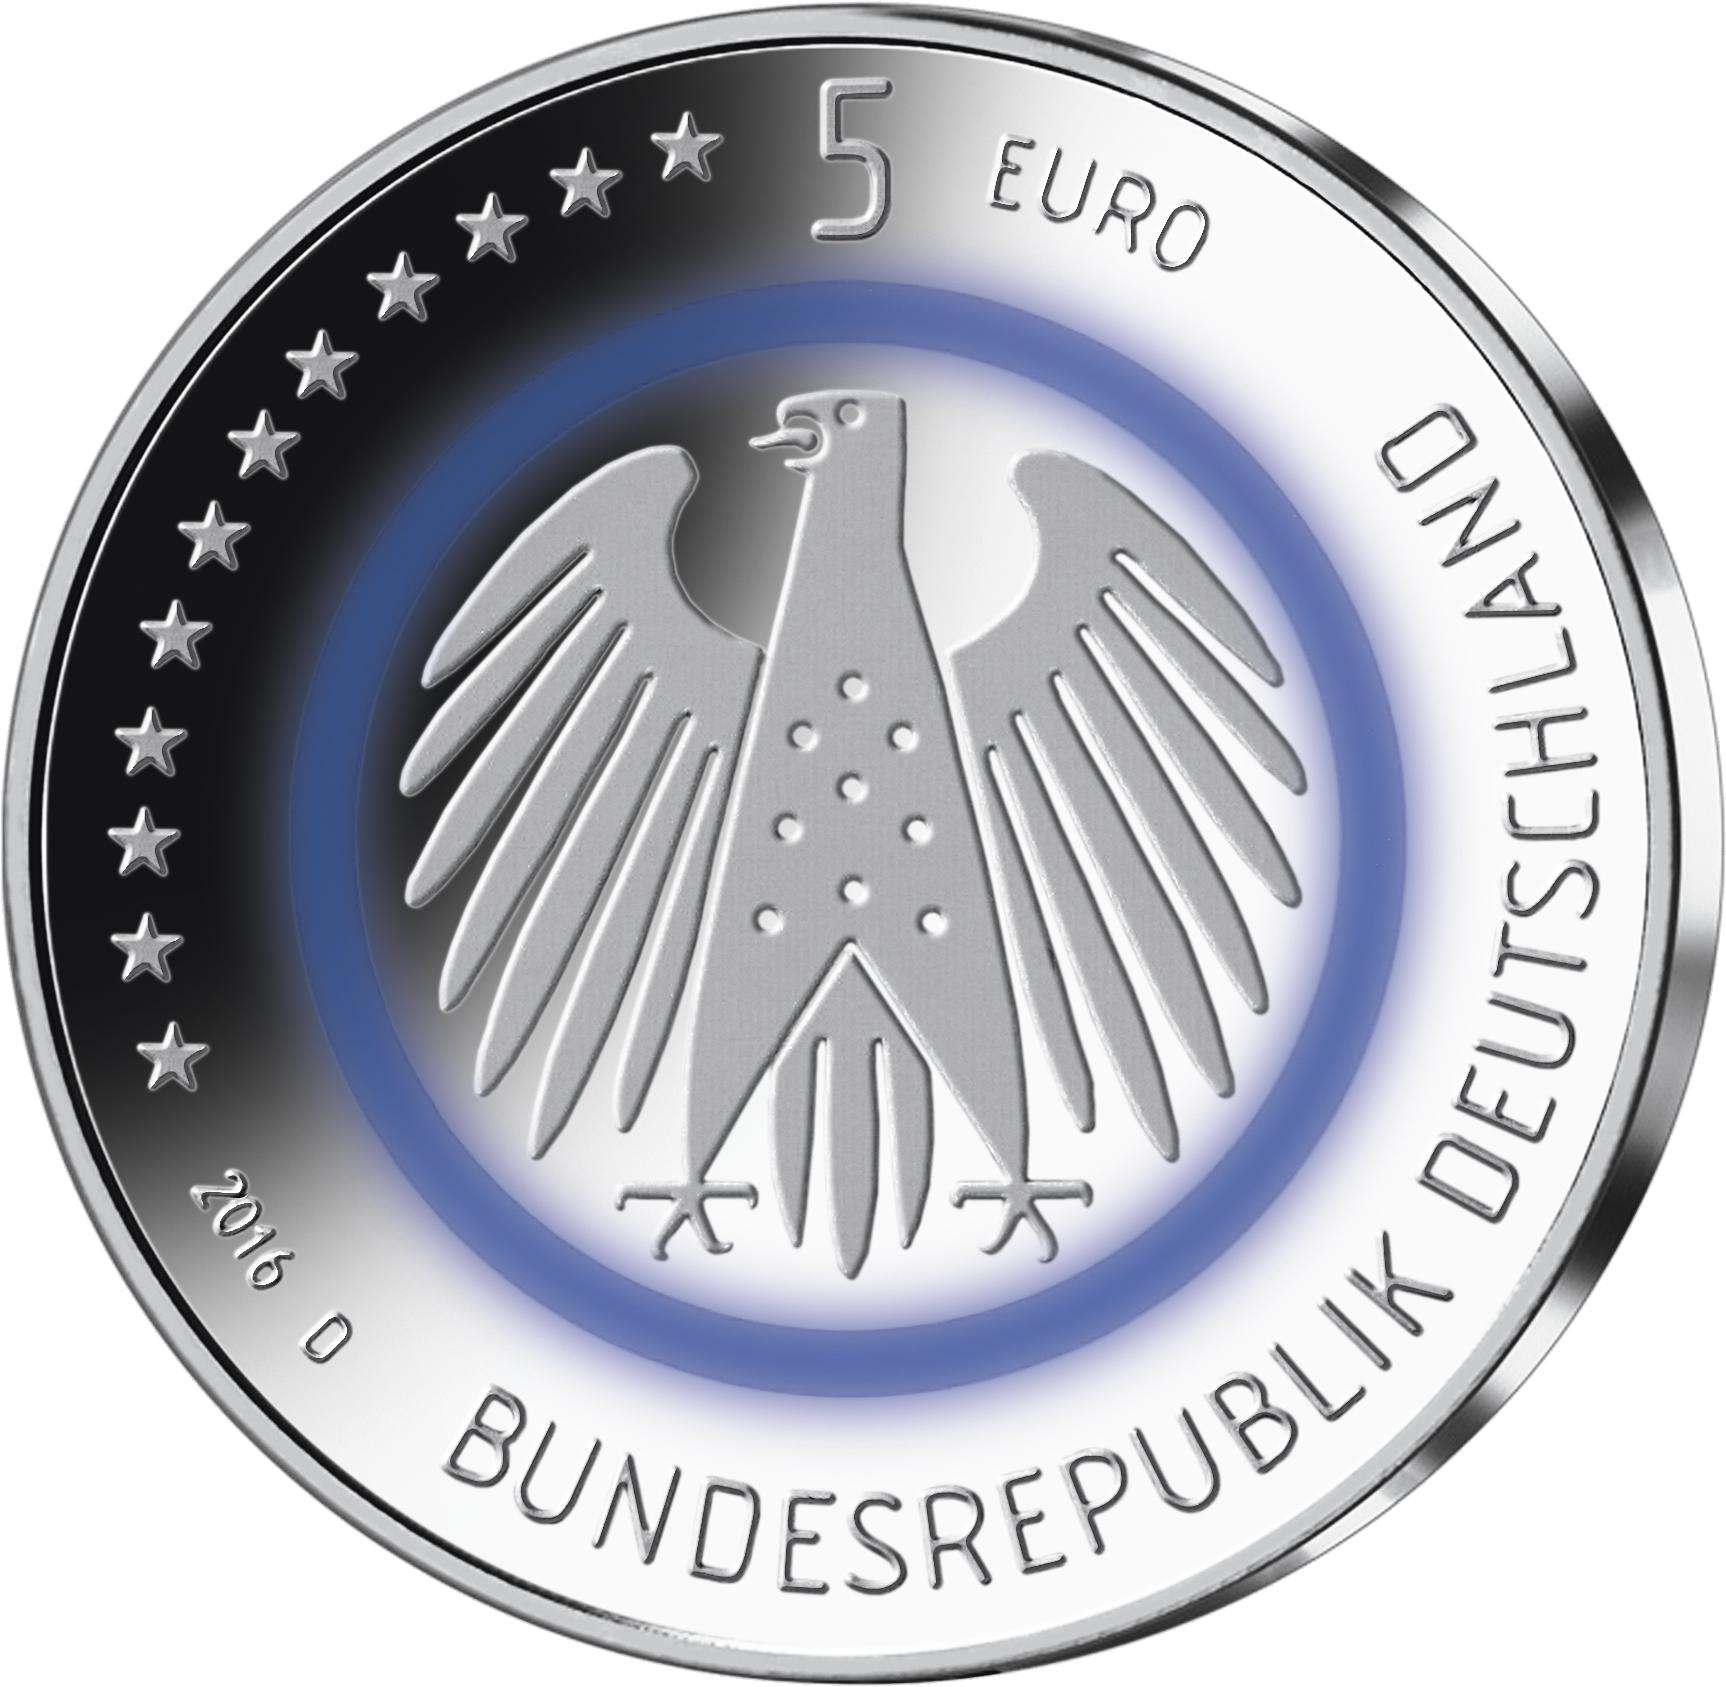 5 Euro Planet Erde Eigenes Blau Pro Prägestätte Mdm Deutsche Münze